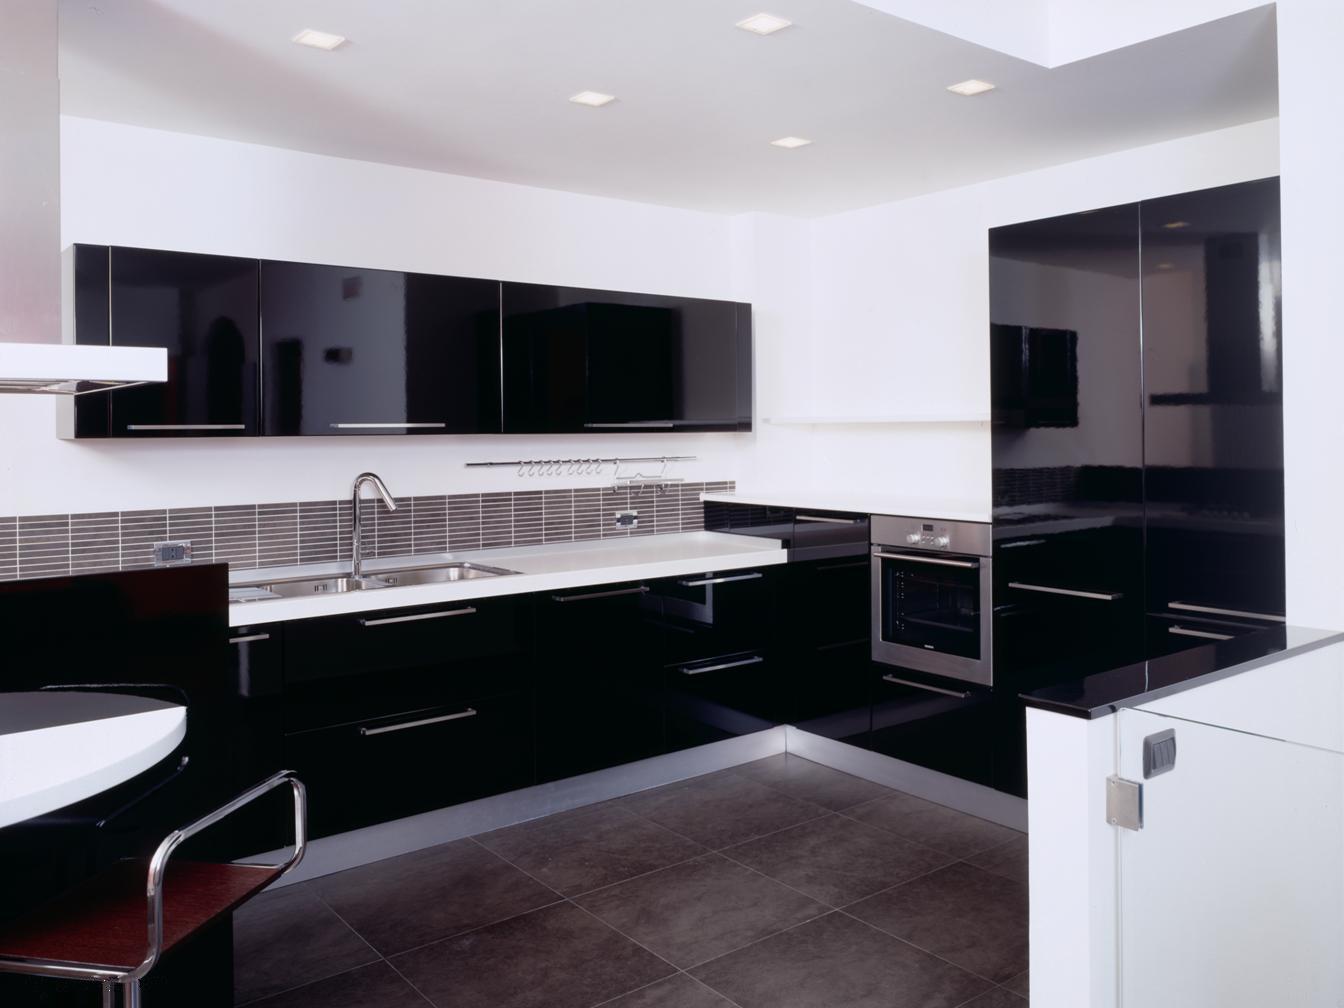 klikrumahanda Kitchen Set yang Berfungsi Ganda sebagai Cermin